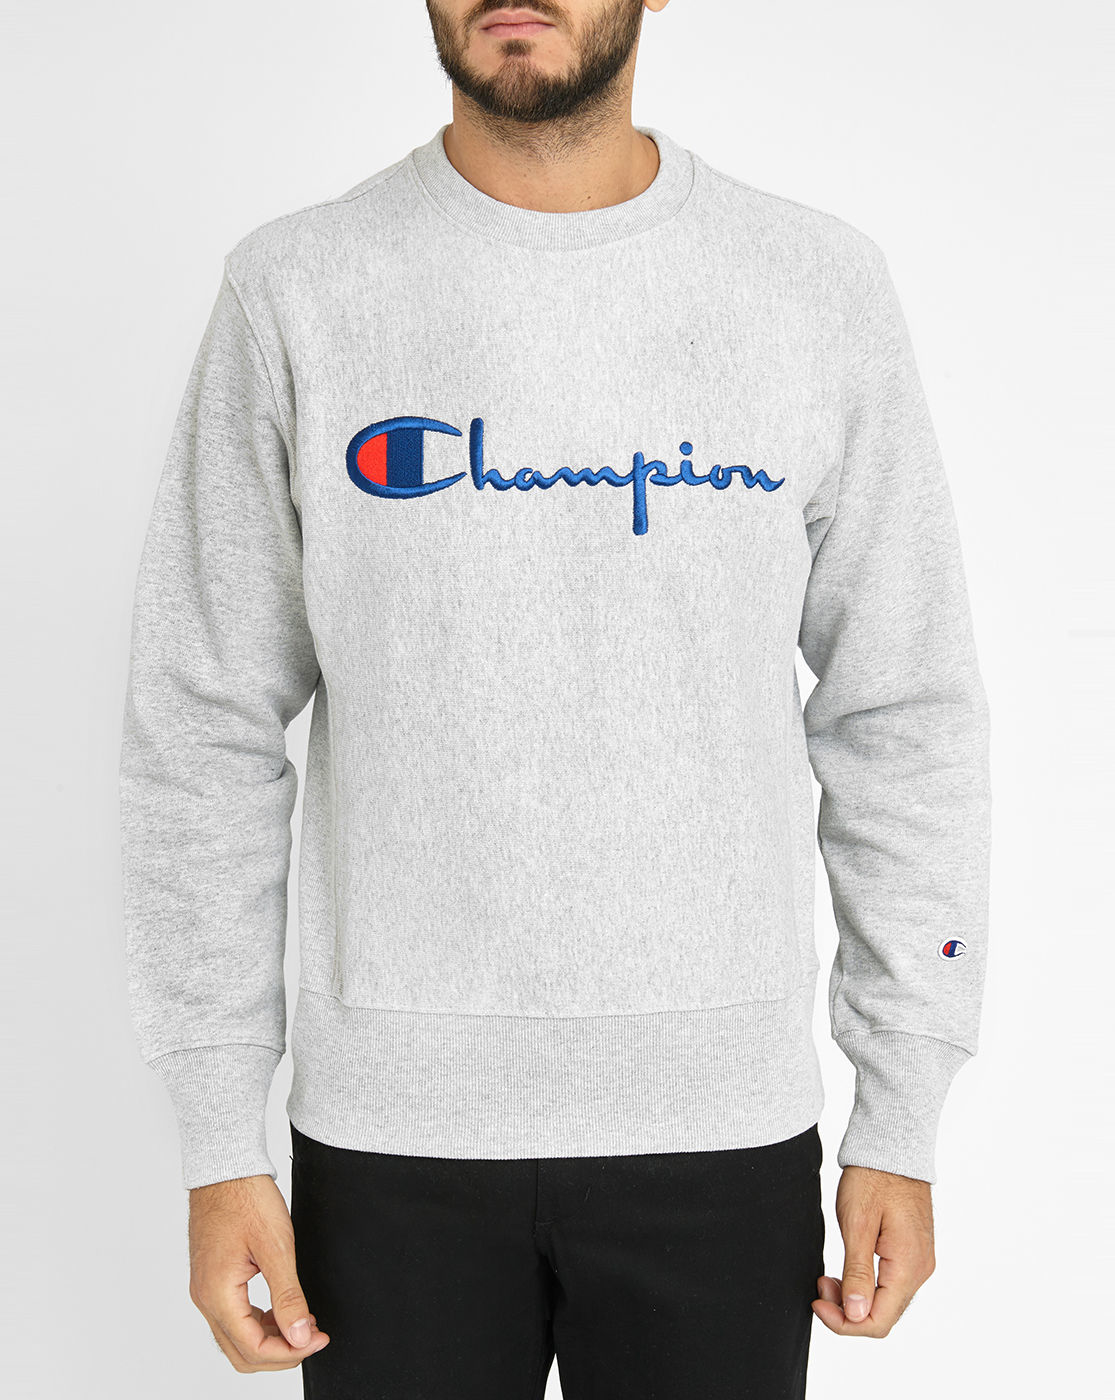 Champion Reverse Weave Sweatshirt | Fashion Ql